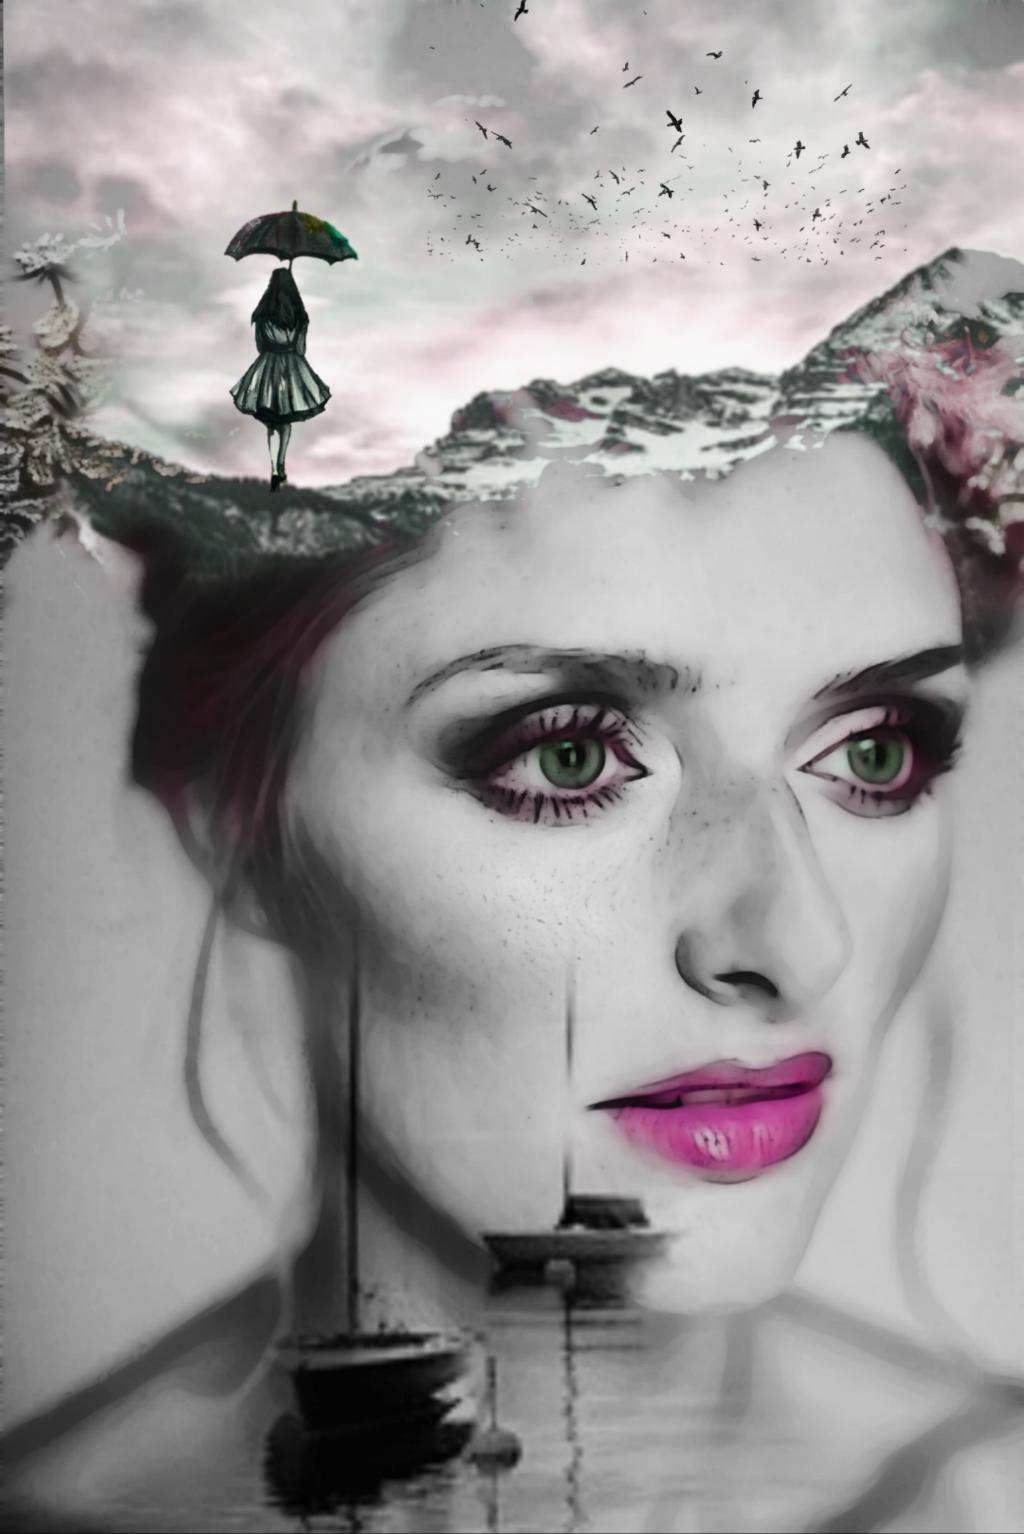 Original Picture is from @freetoedit   #surreal #surrealism #doubleexposure #double_exposure #creative #inspiration #faceart #madewithpicsart #manipulation #be_creative #effects #picsartedit #myedit #beautiful #women #portrait #heypicsart @picsart